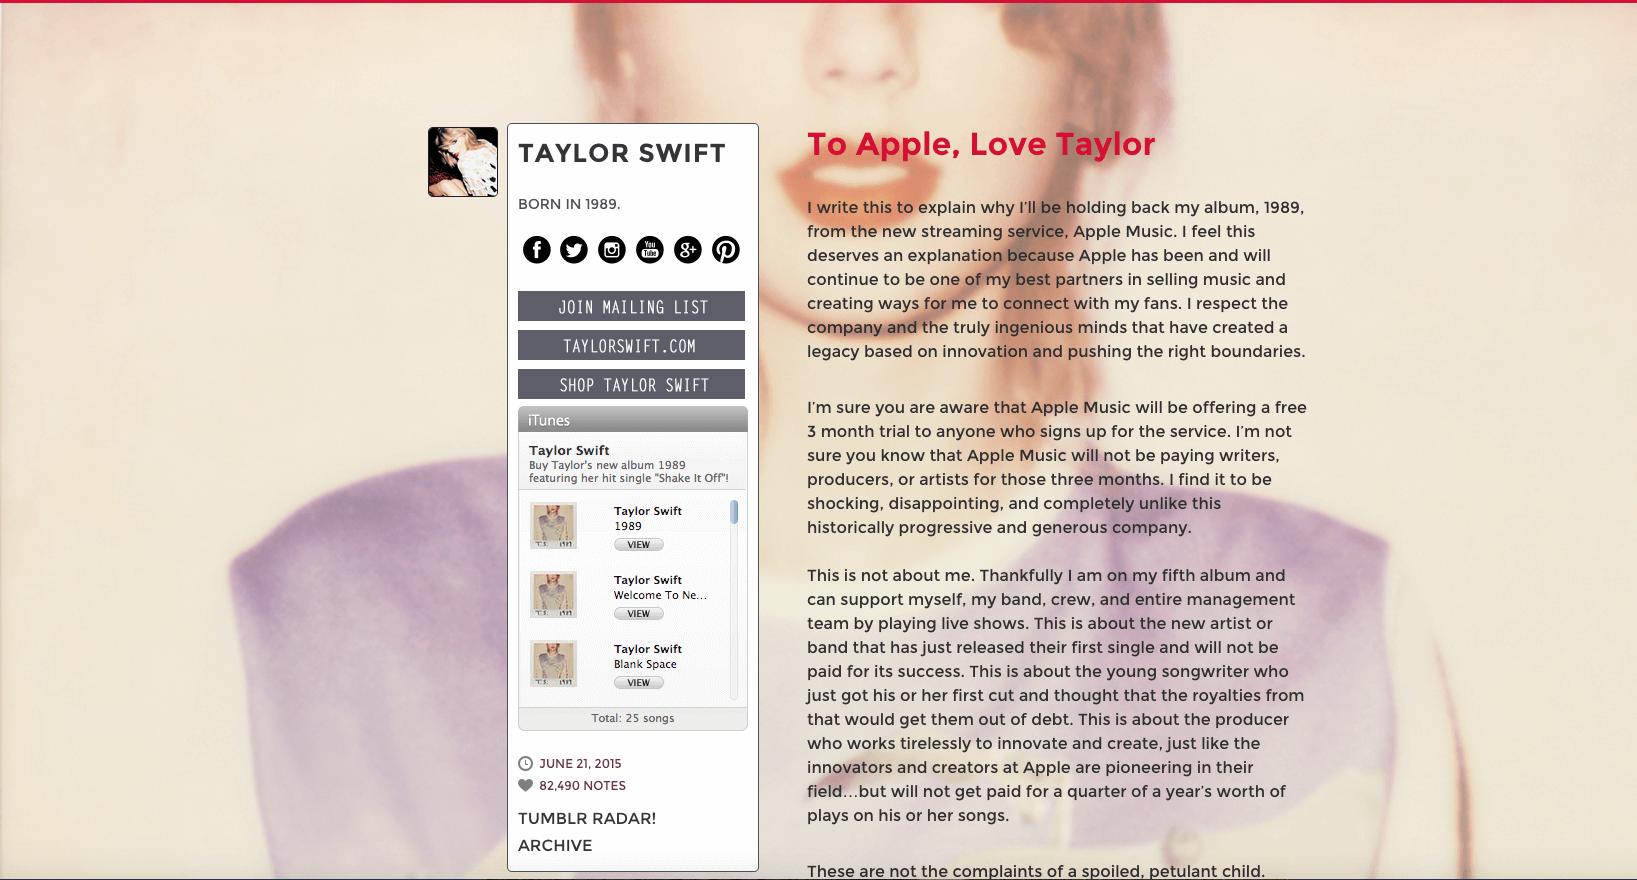 To Taylor Swift, Love Spin Sucks